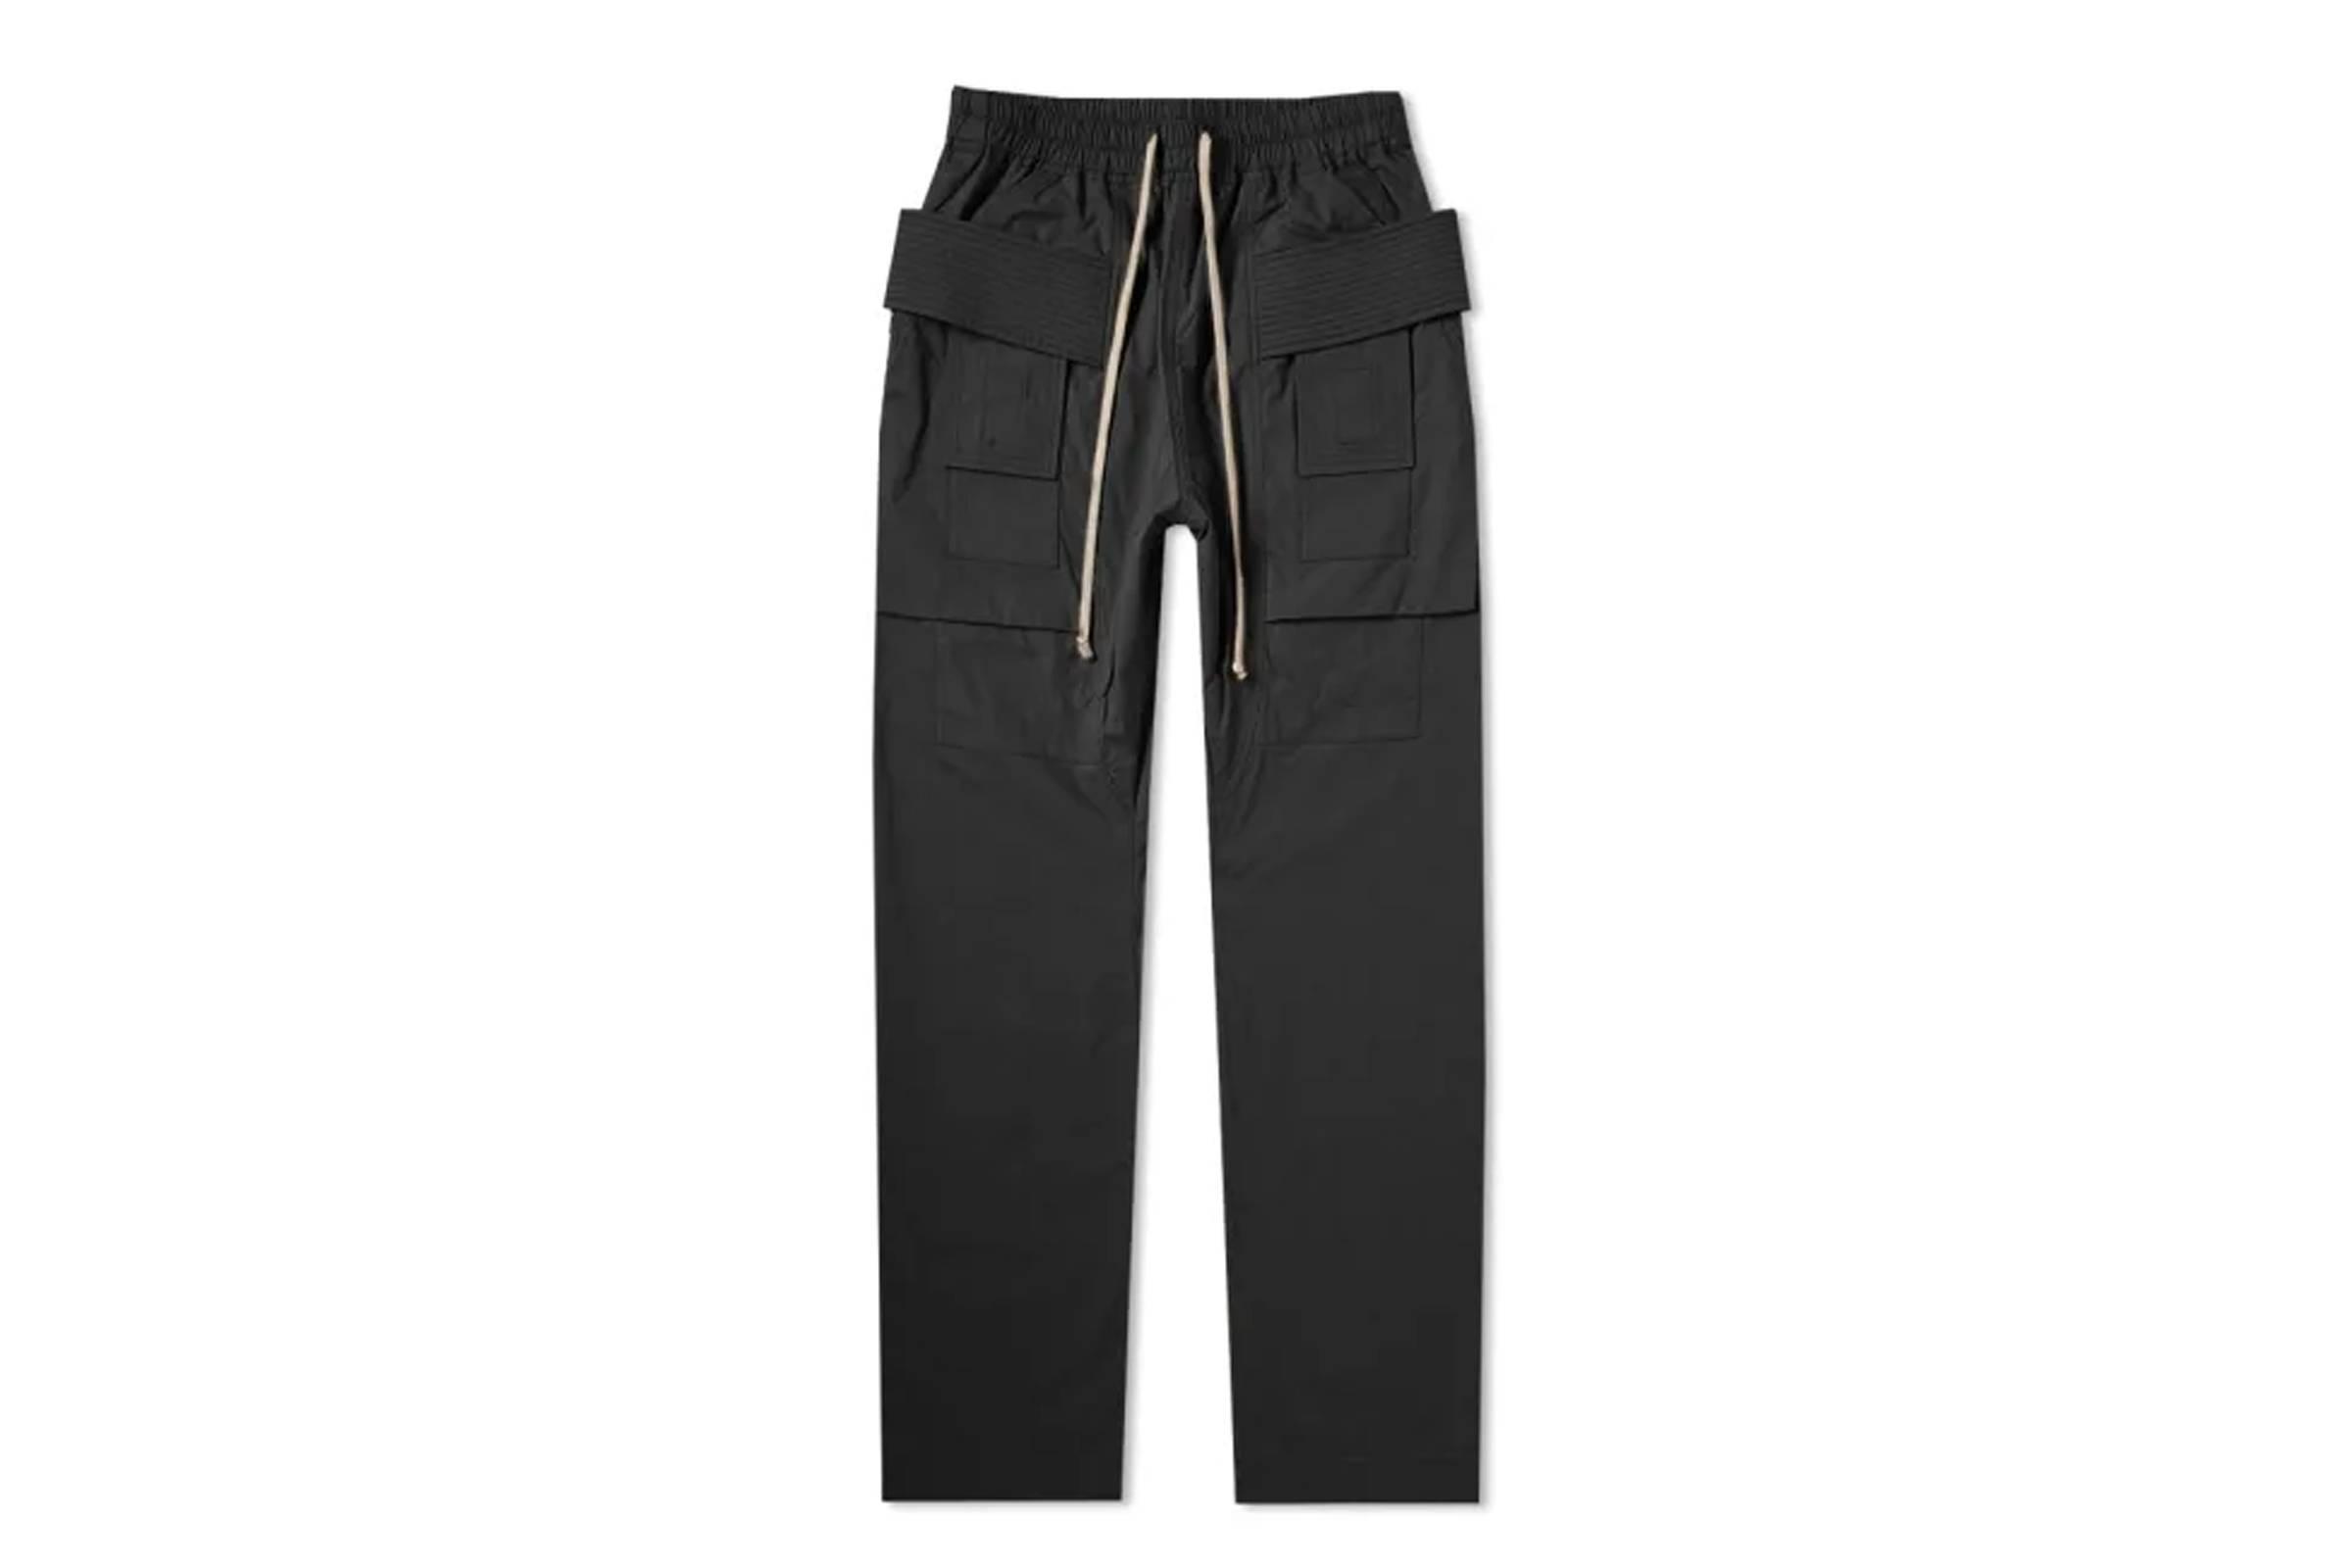 Rick Owens Creatch Cargo Pants